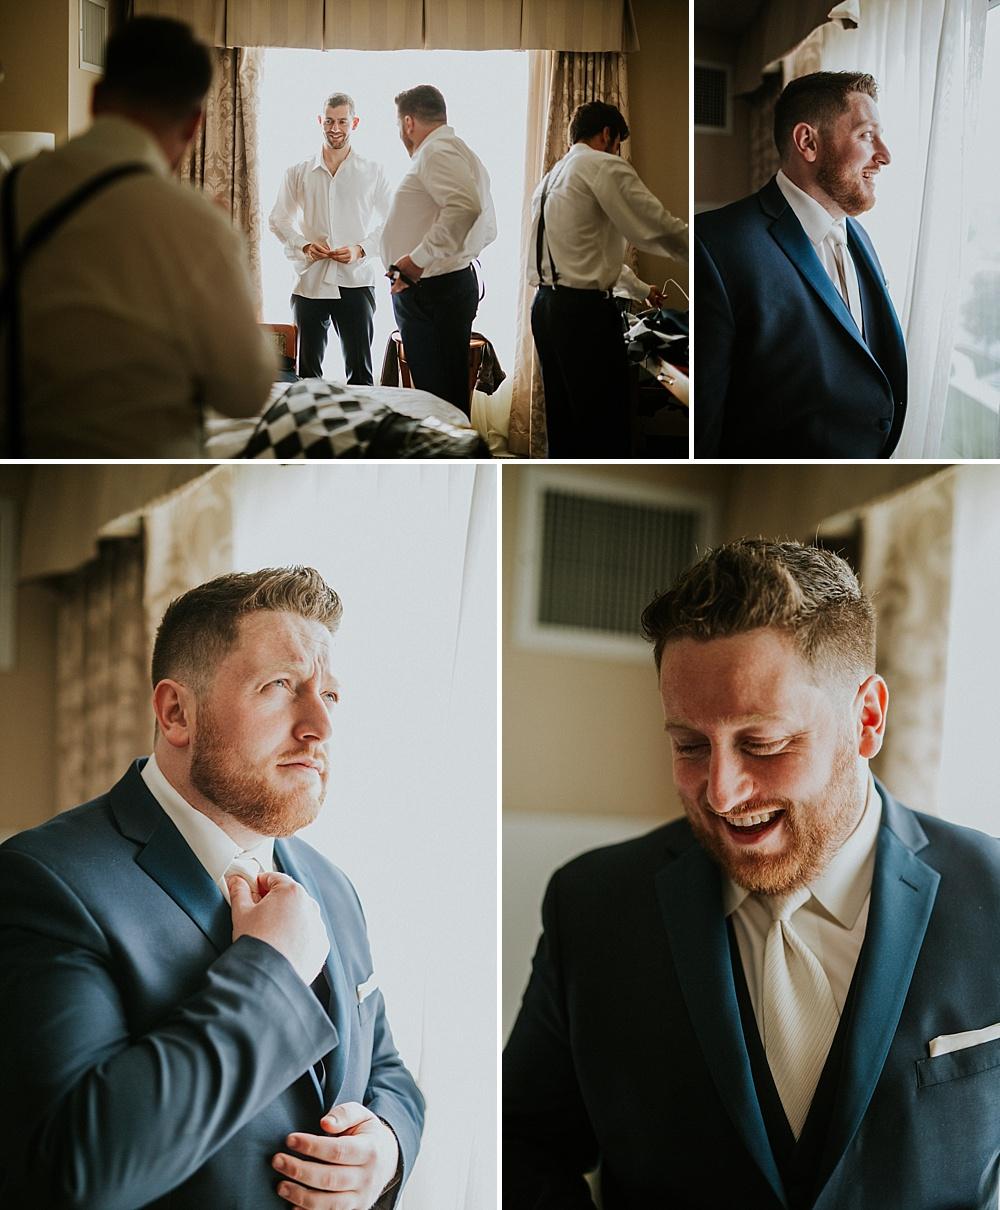 Mike-Stephanie_chicago_wedding_liller-photo-00008.jpg